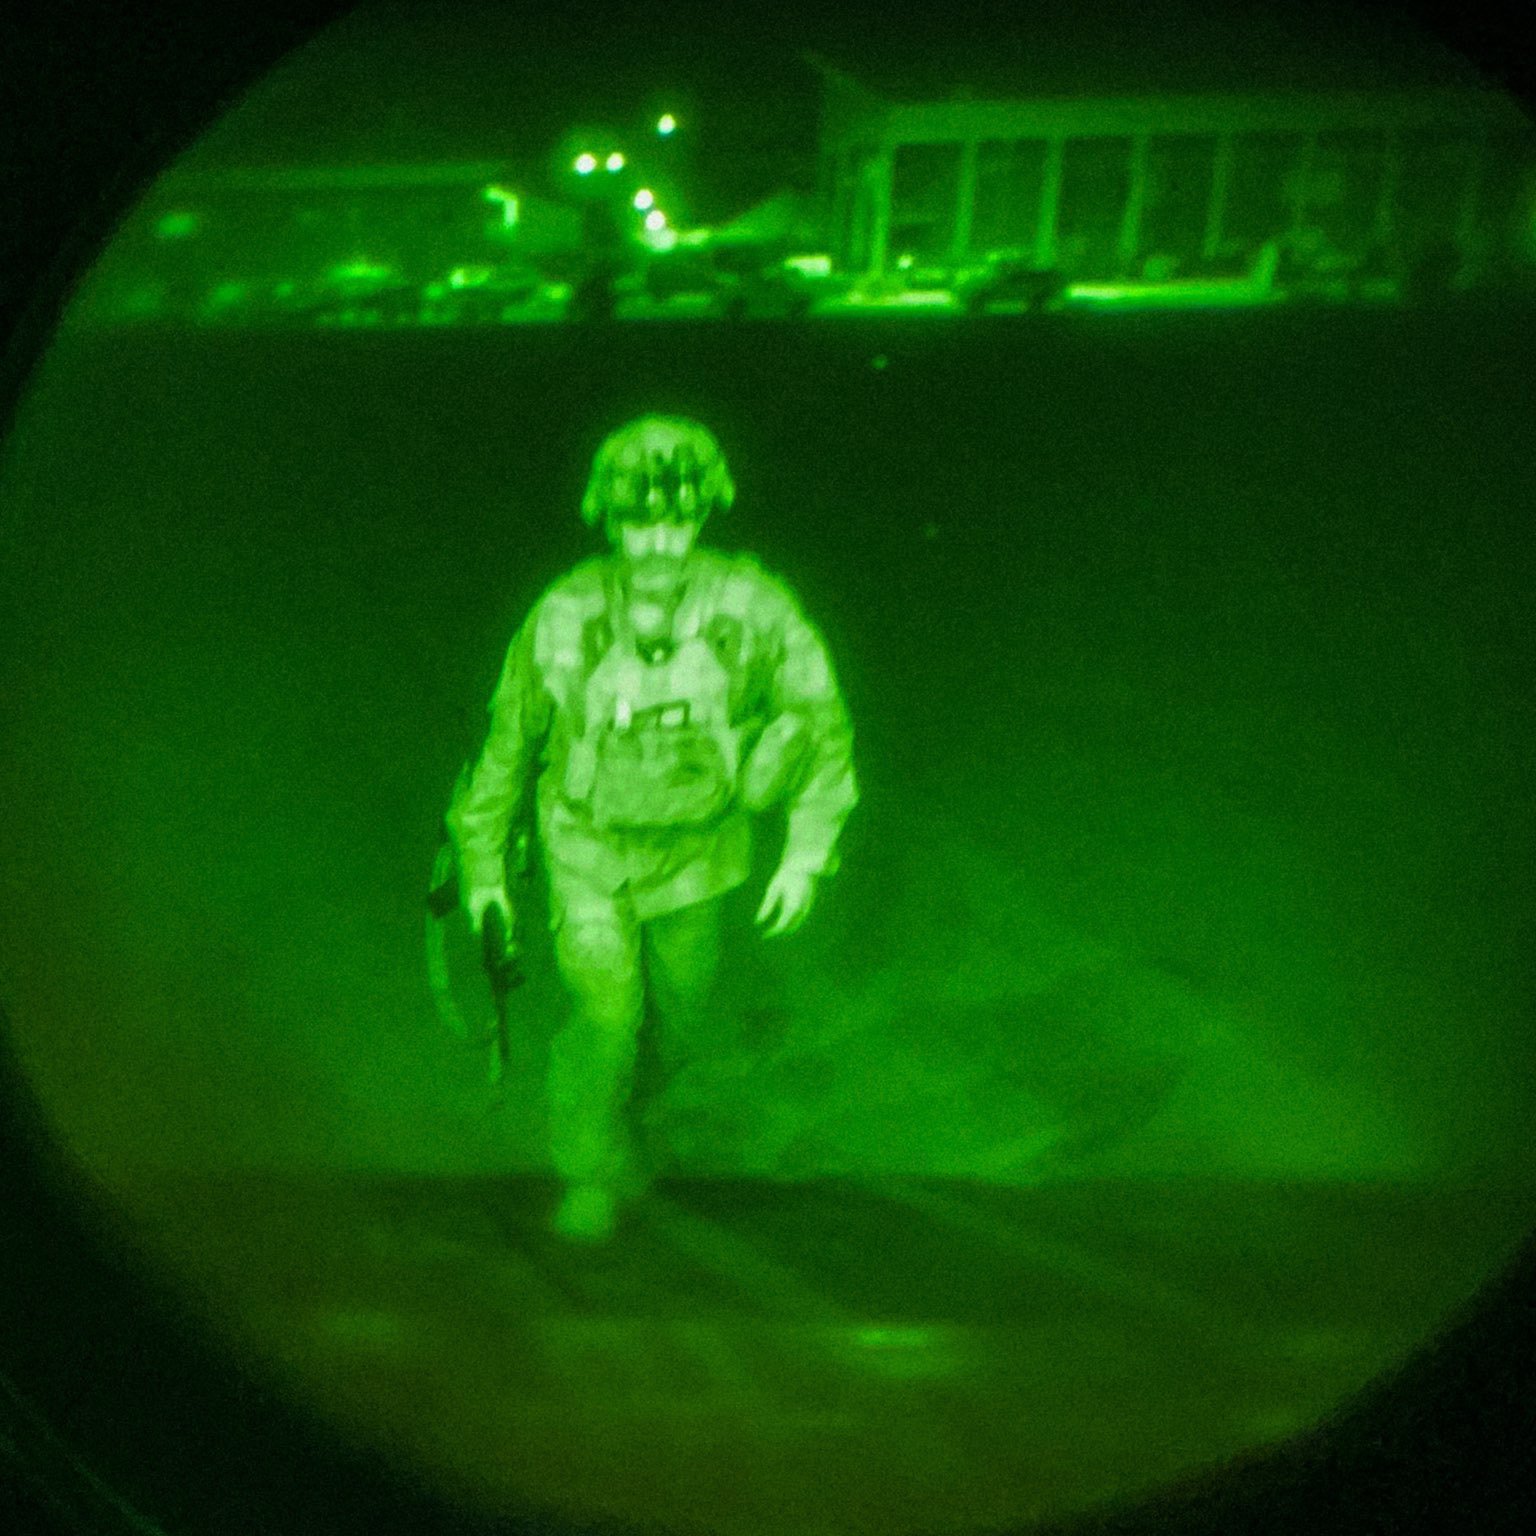 Фото дня. Последний американский военный покинул Афганистан